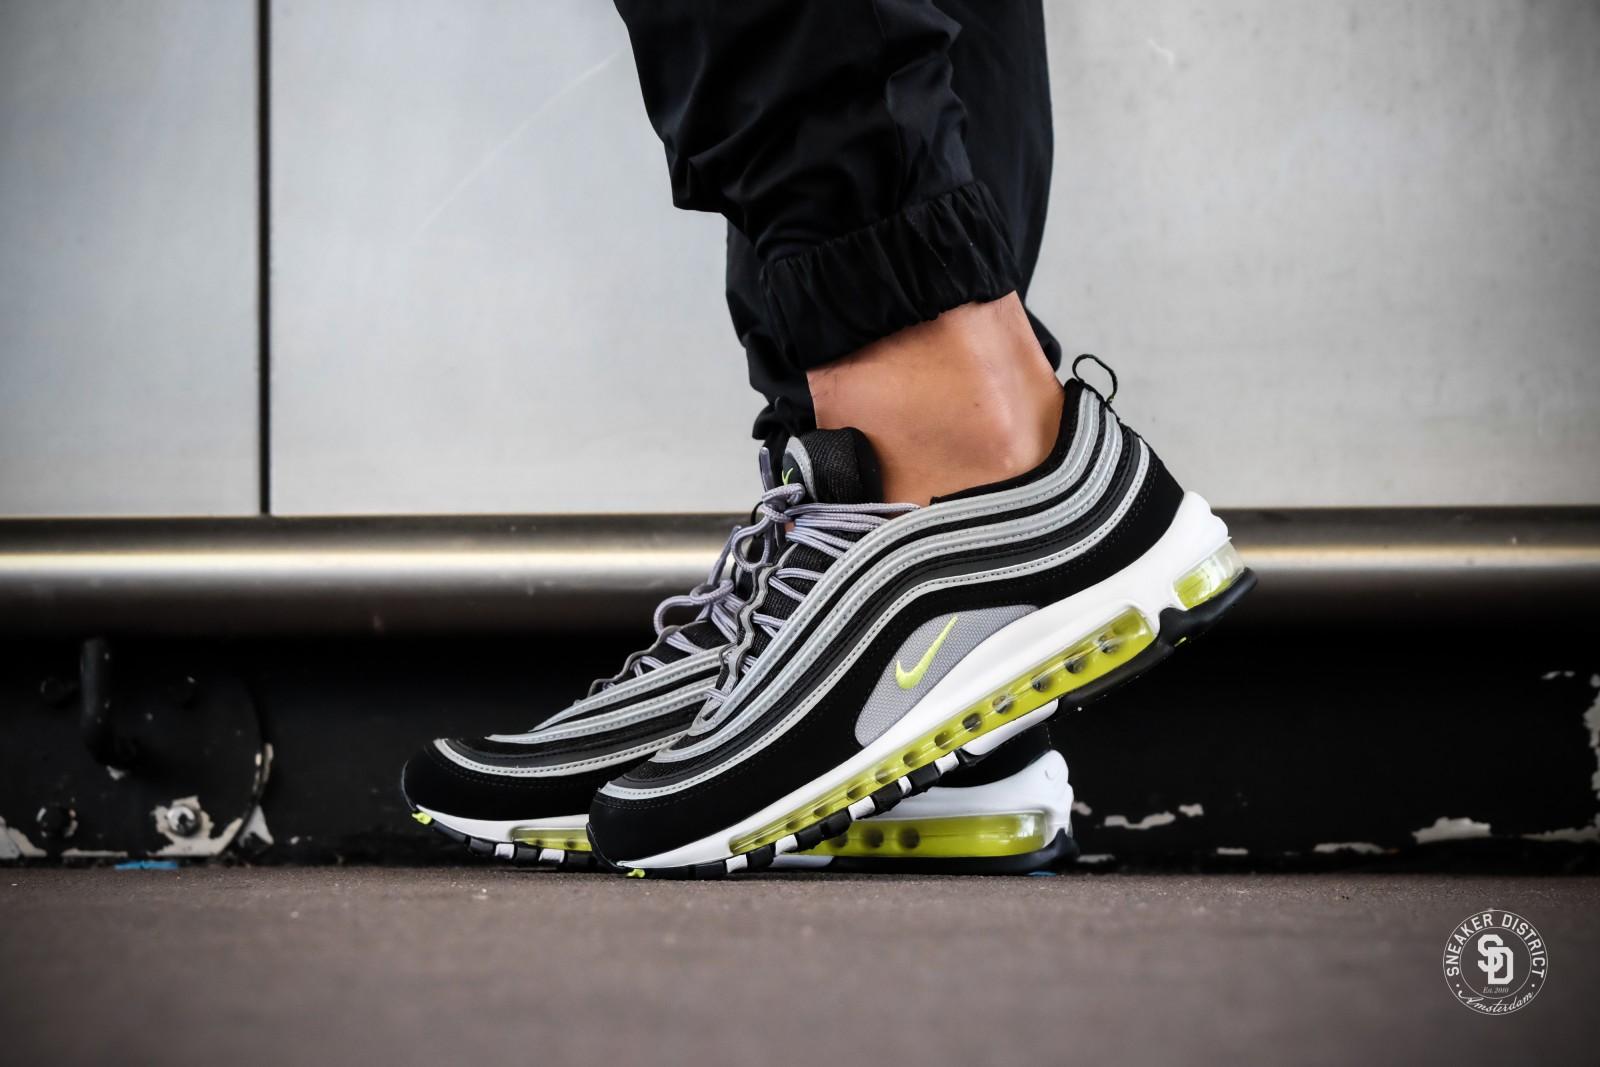 Nike Air Max 97 Black Volt Metallic Silver Sneakers